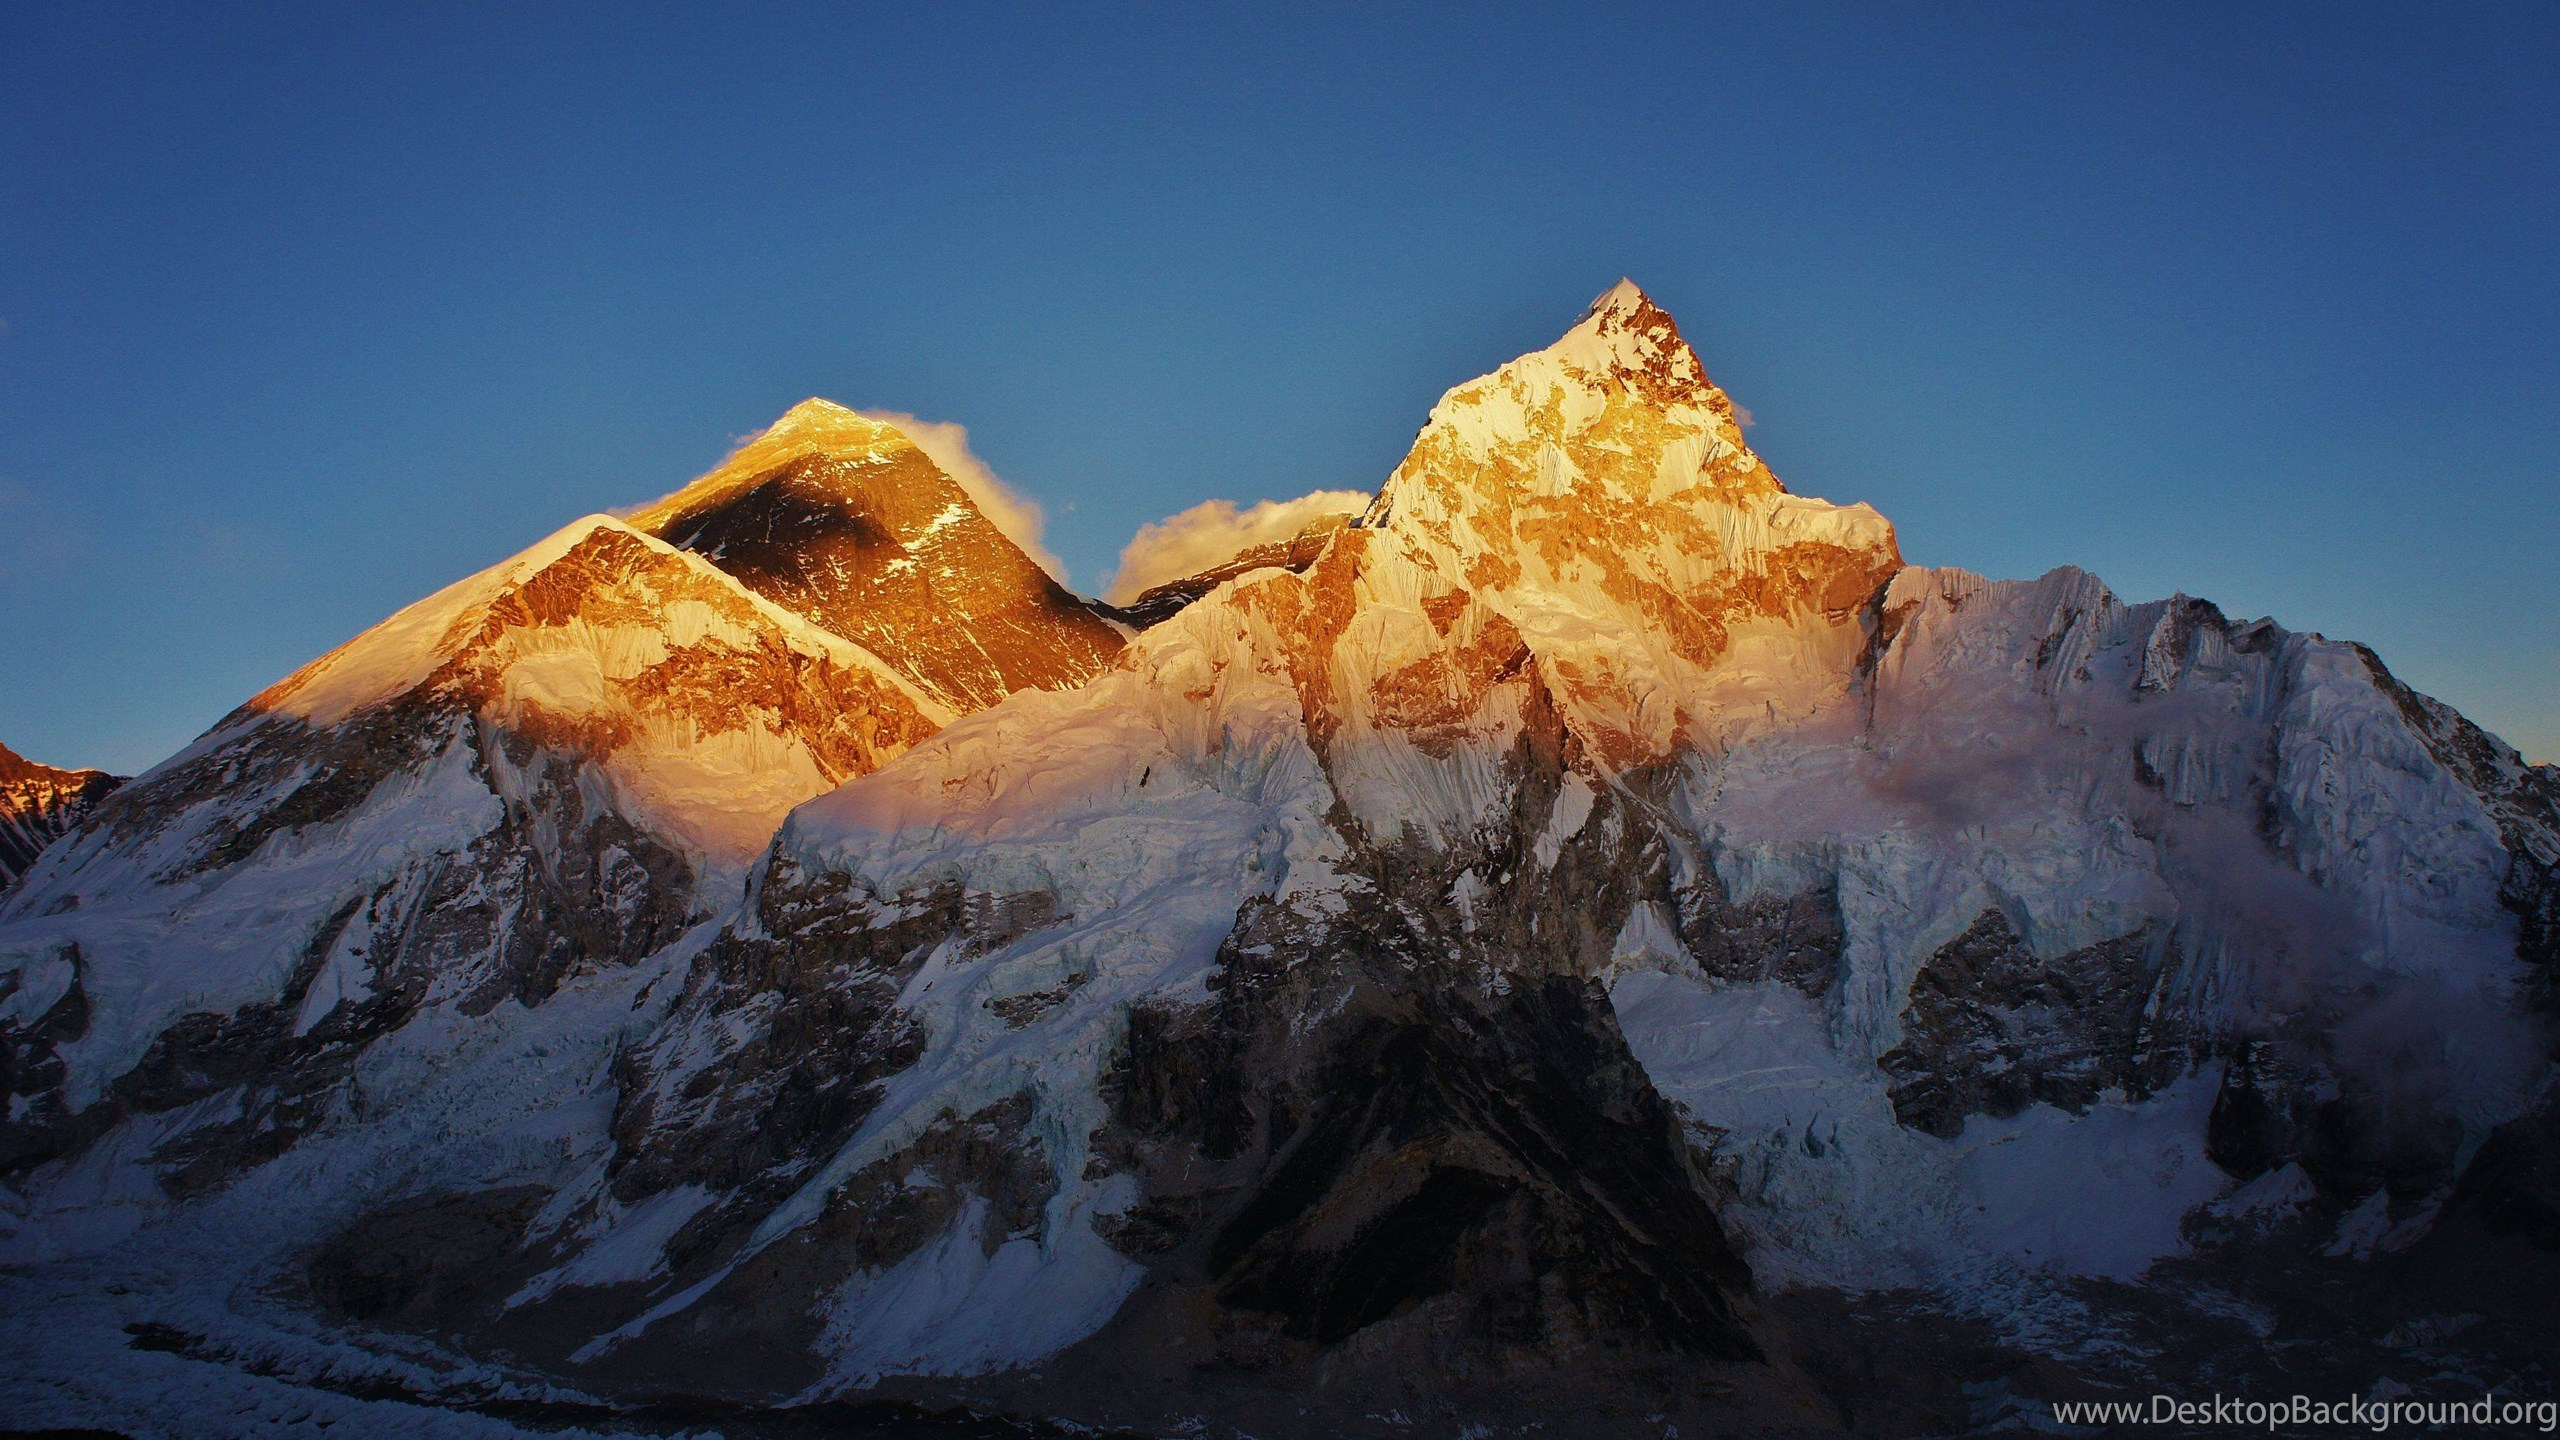 Mount Everest Wallpapers Desktop Background